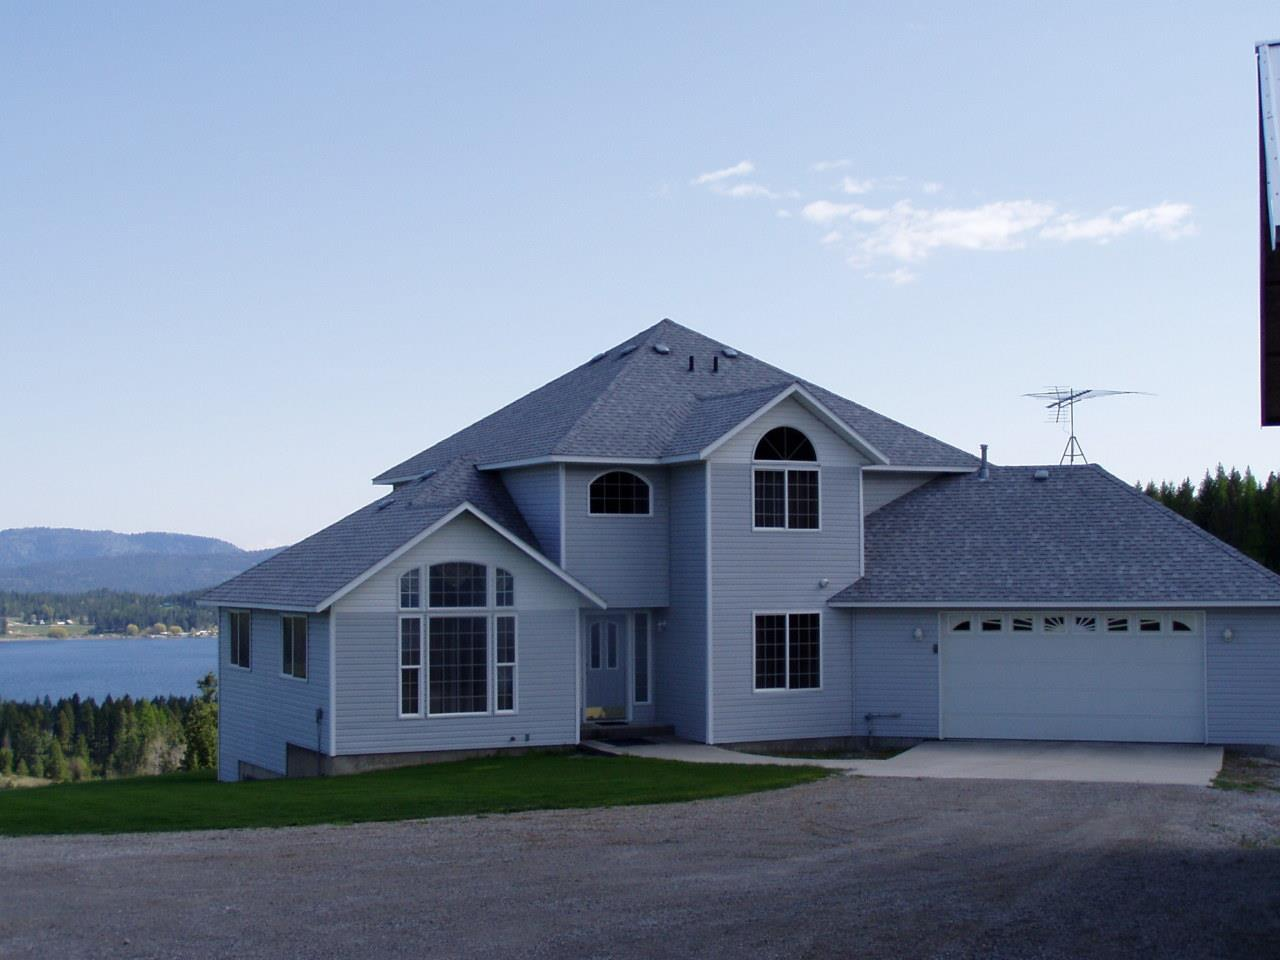 Single Family Home for Sale at 33XX-B Hoag Road 33XX-B Hoag Road Valley, Washington 99181 United States